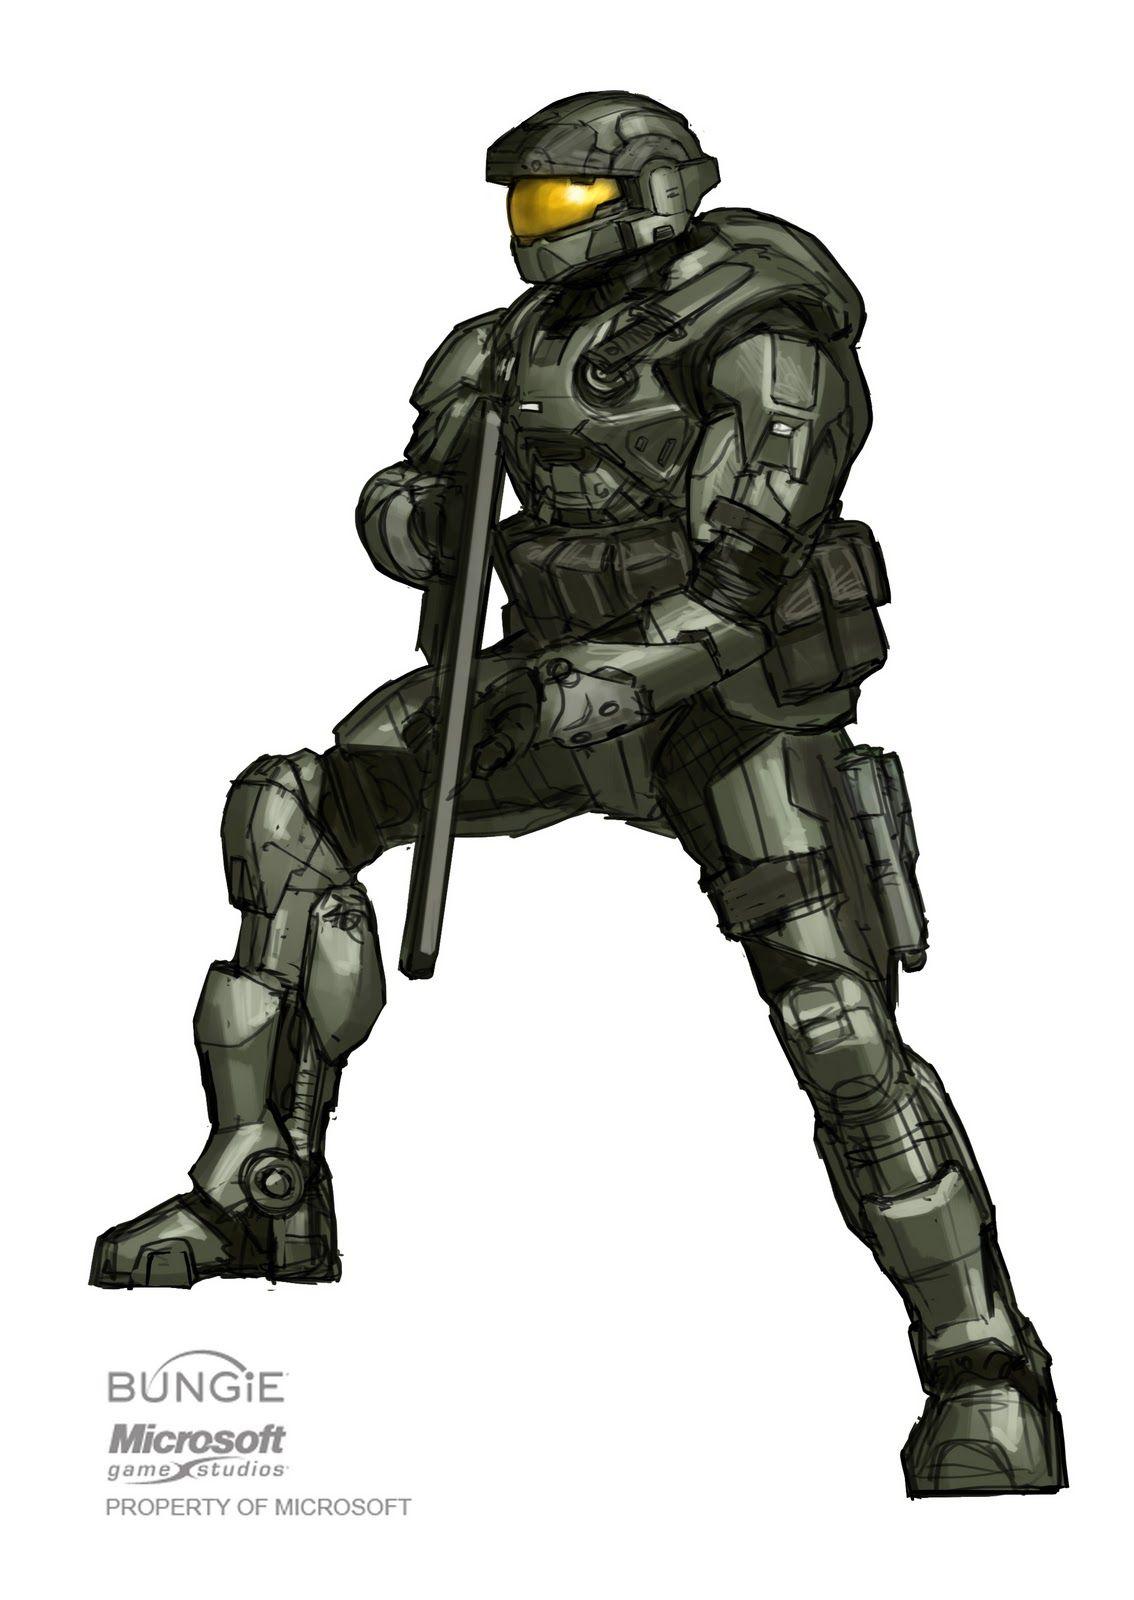 Halo Concept Art Halo Armor Halo Spartan Armor Halo Spartan